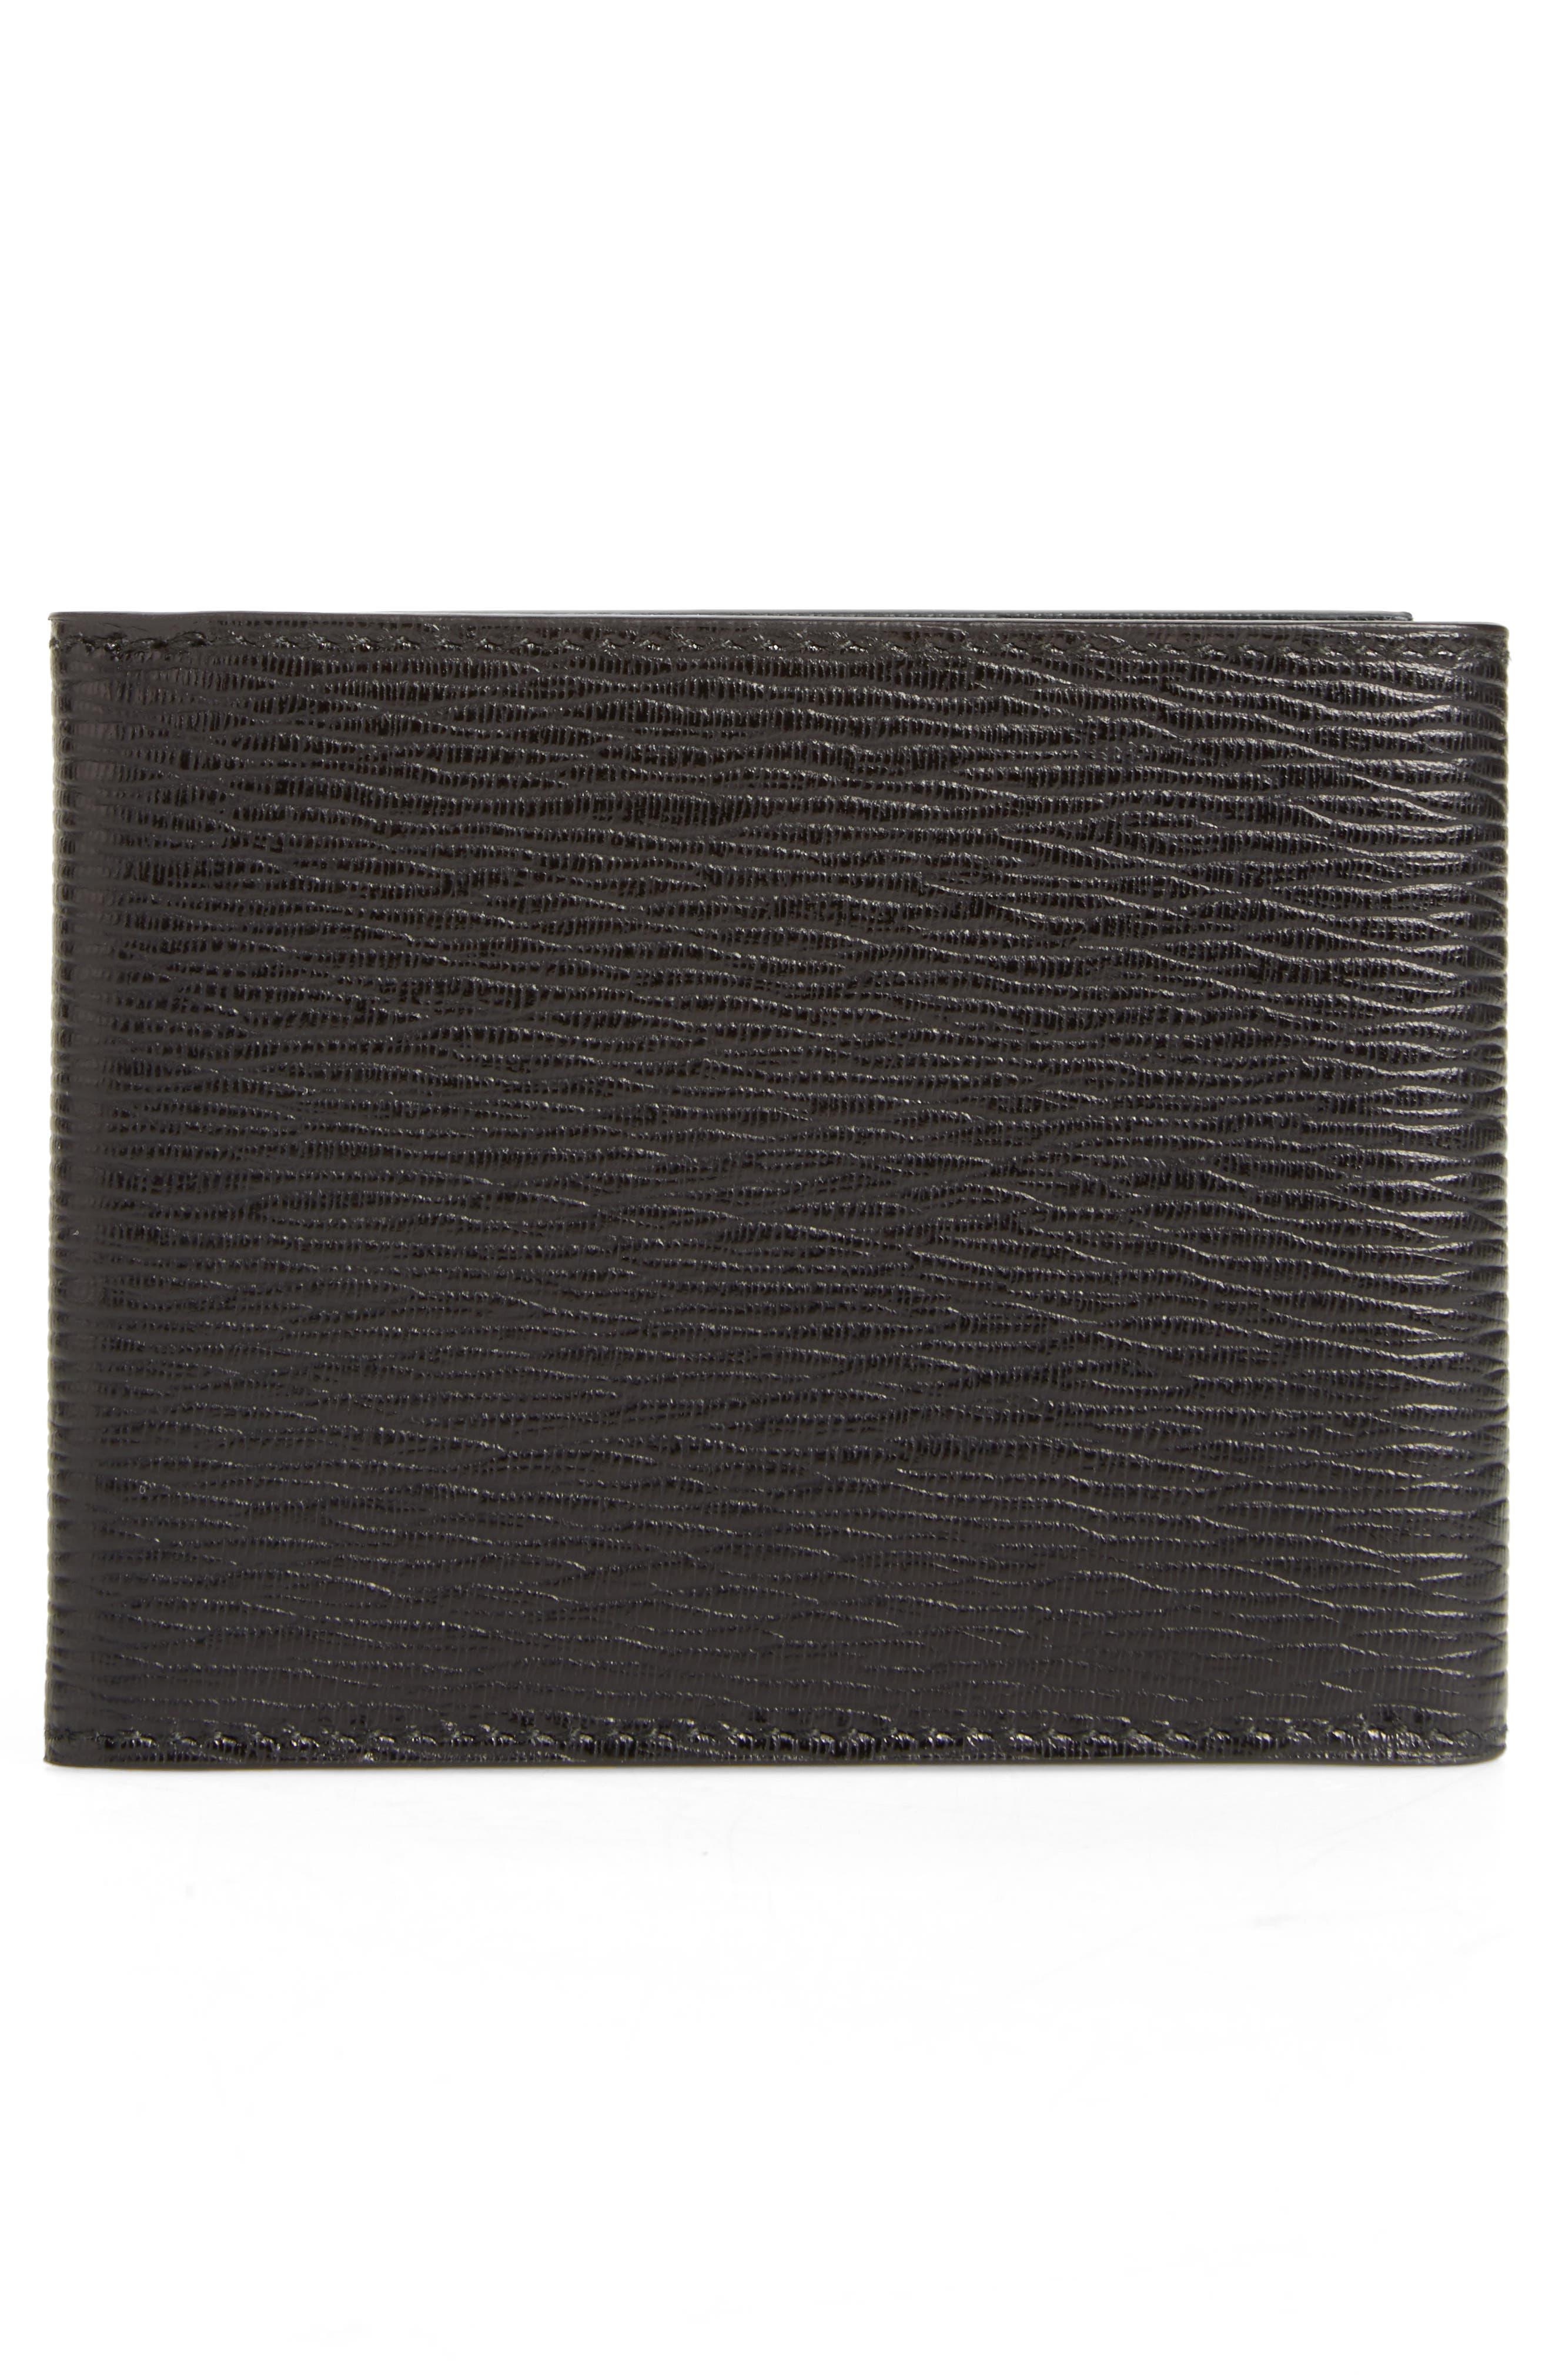 Revival Leather Wallet,                             Alternate thumbnail 3, color,                             Black